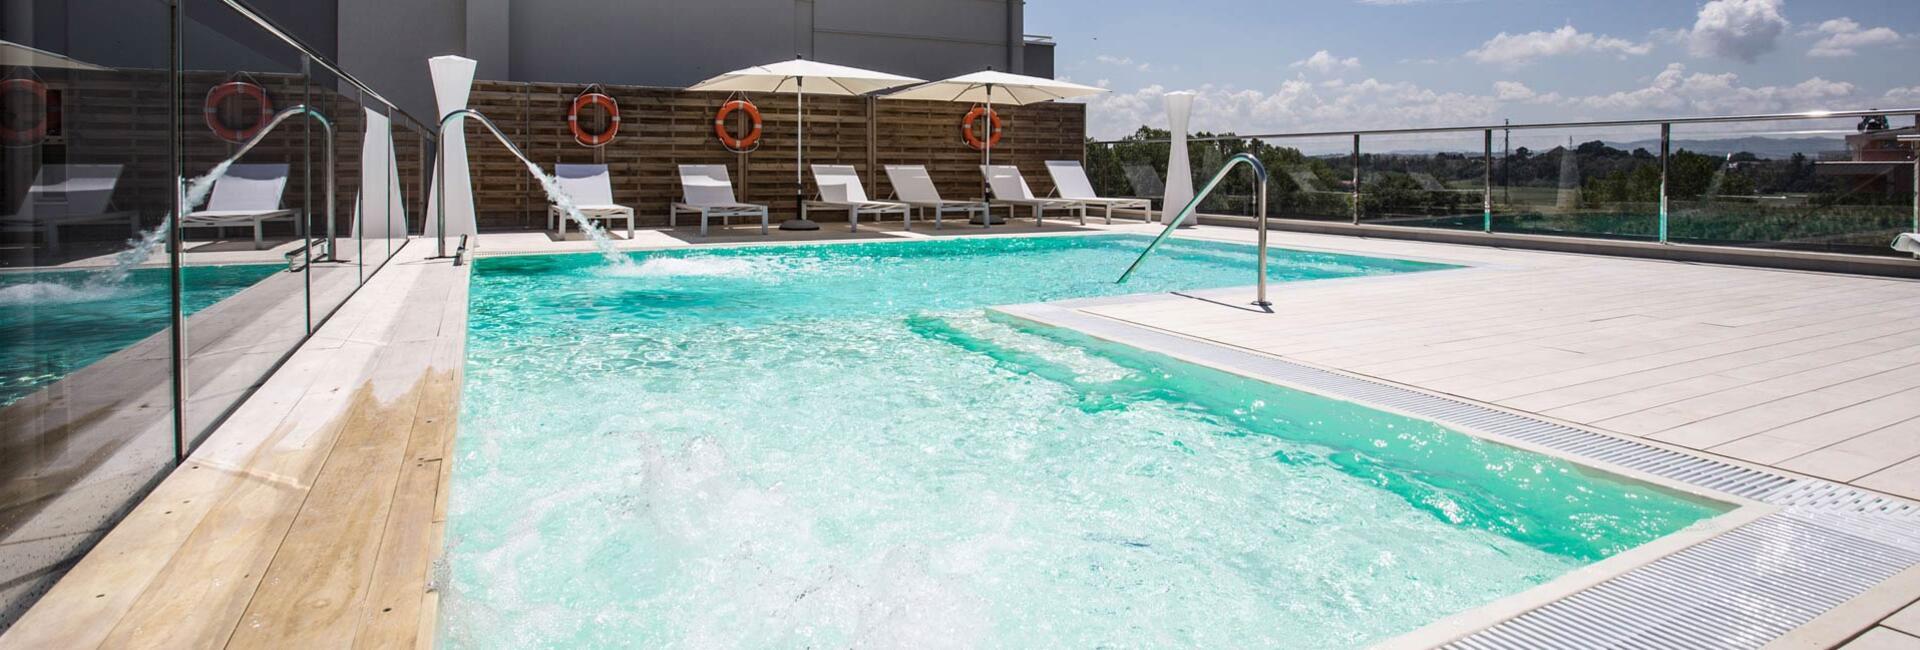 hotelgalamisano it piscina 002